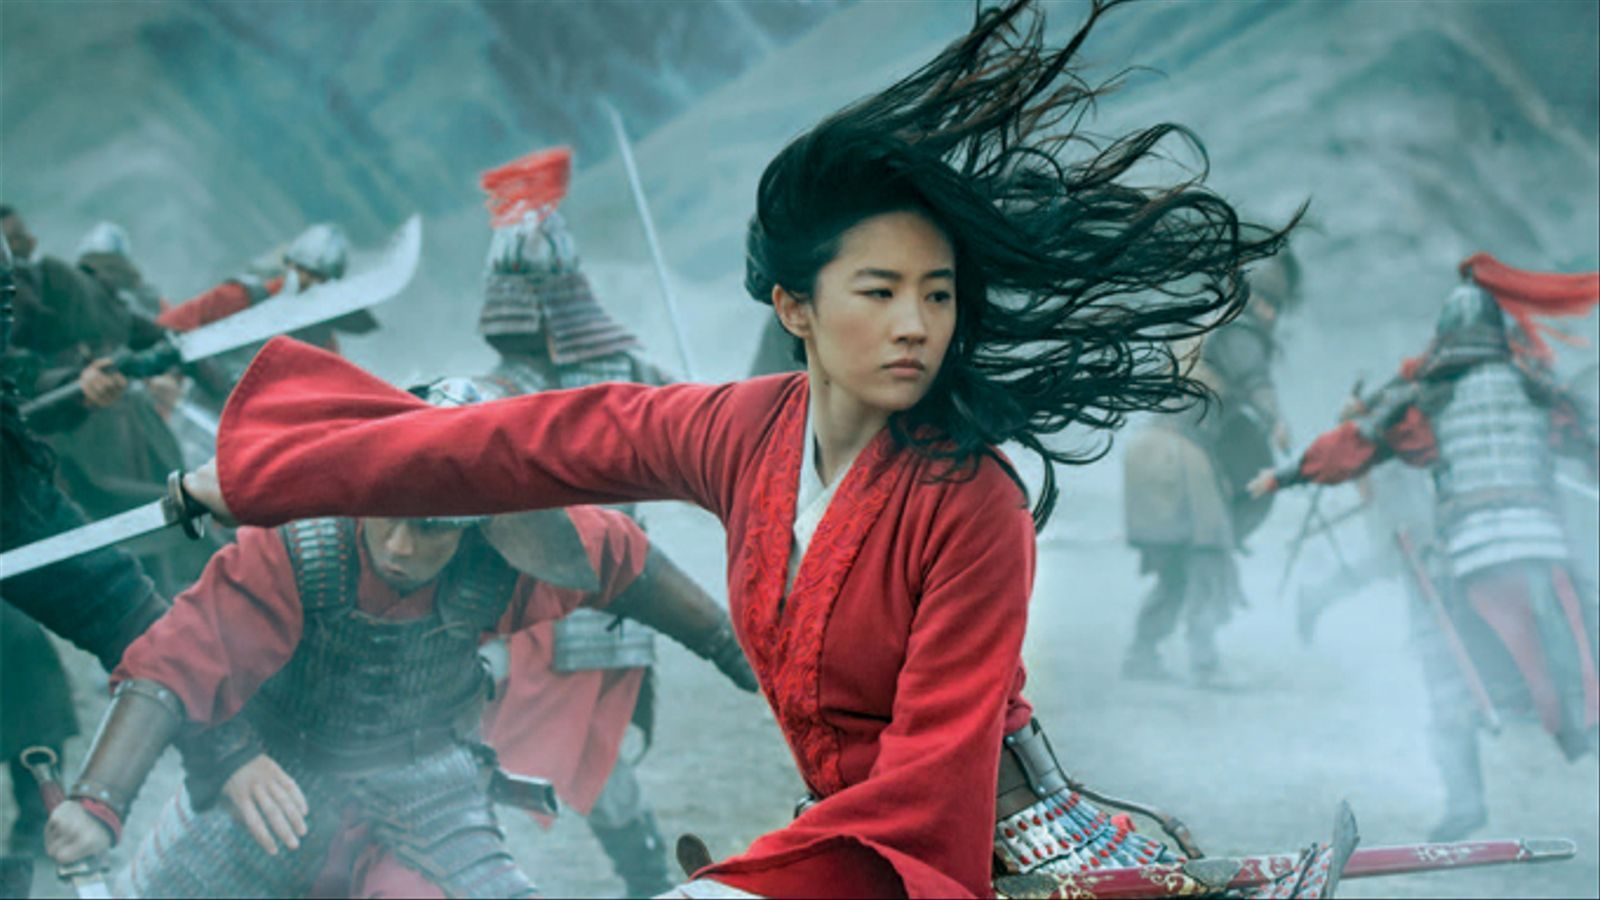 L'actriu xinesa Yifei Liu dona vida a Mulan